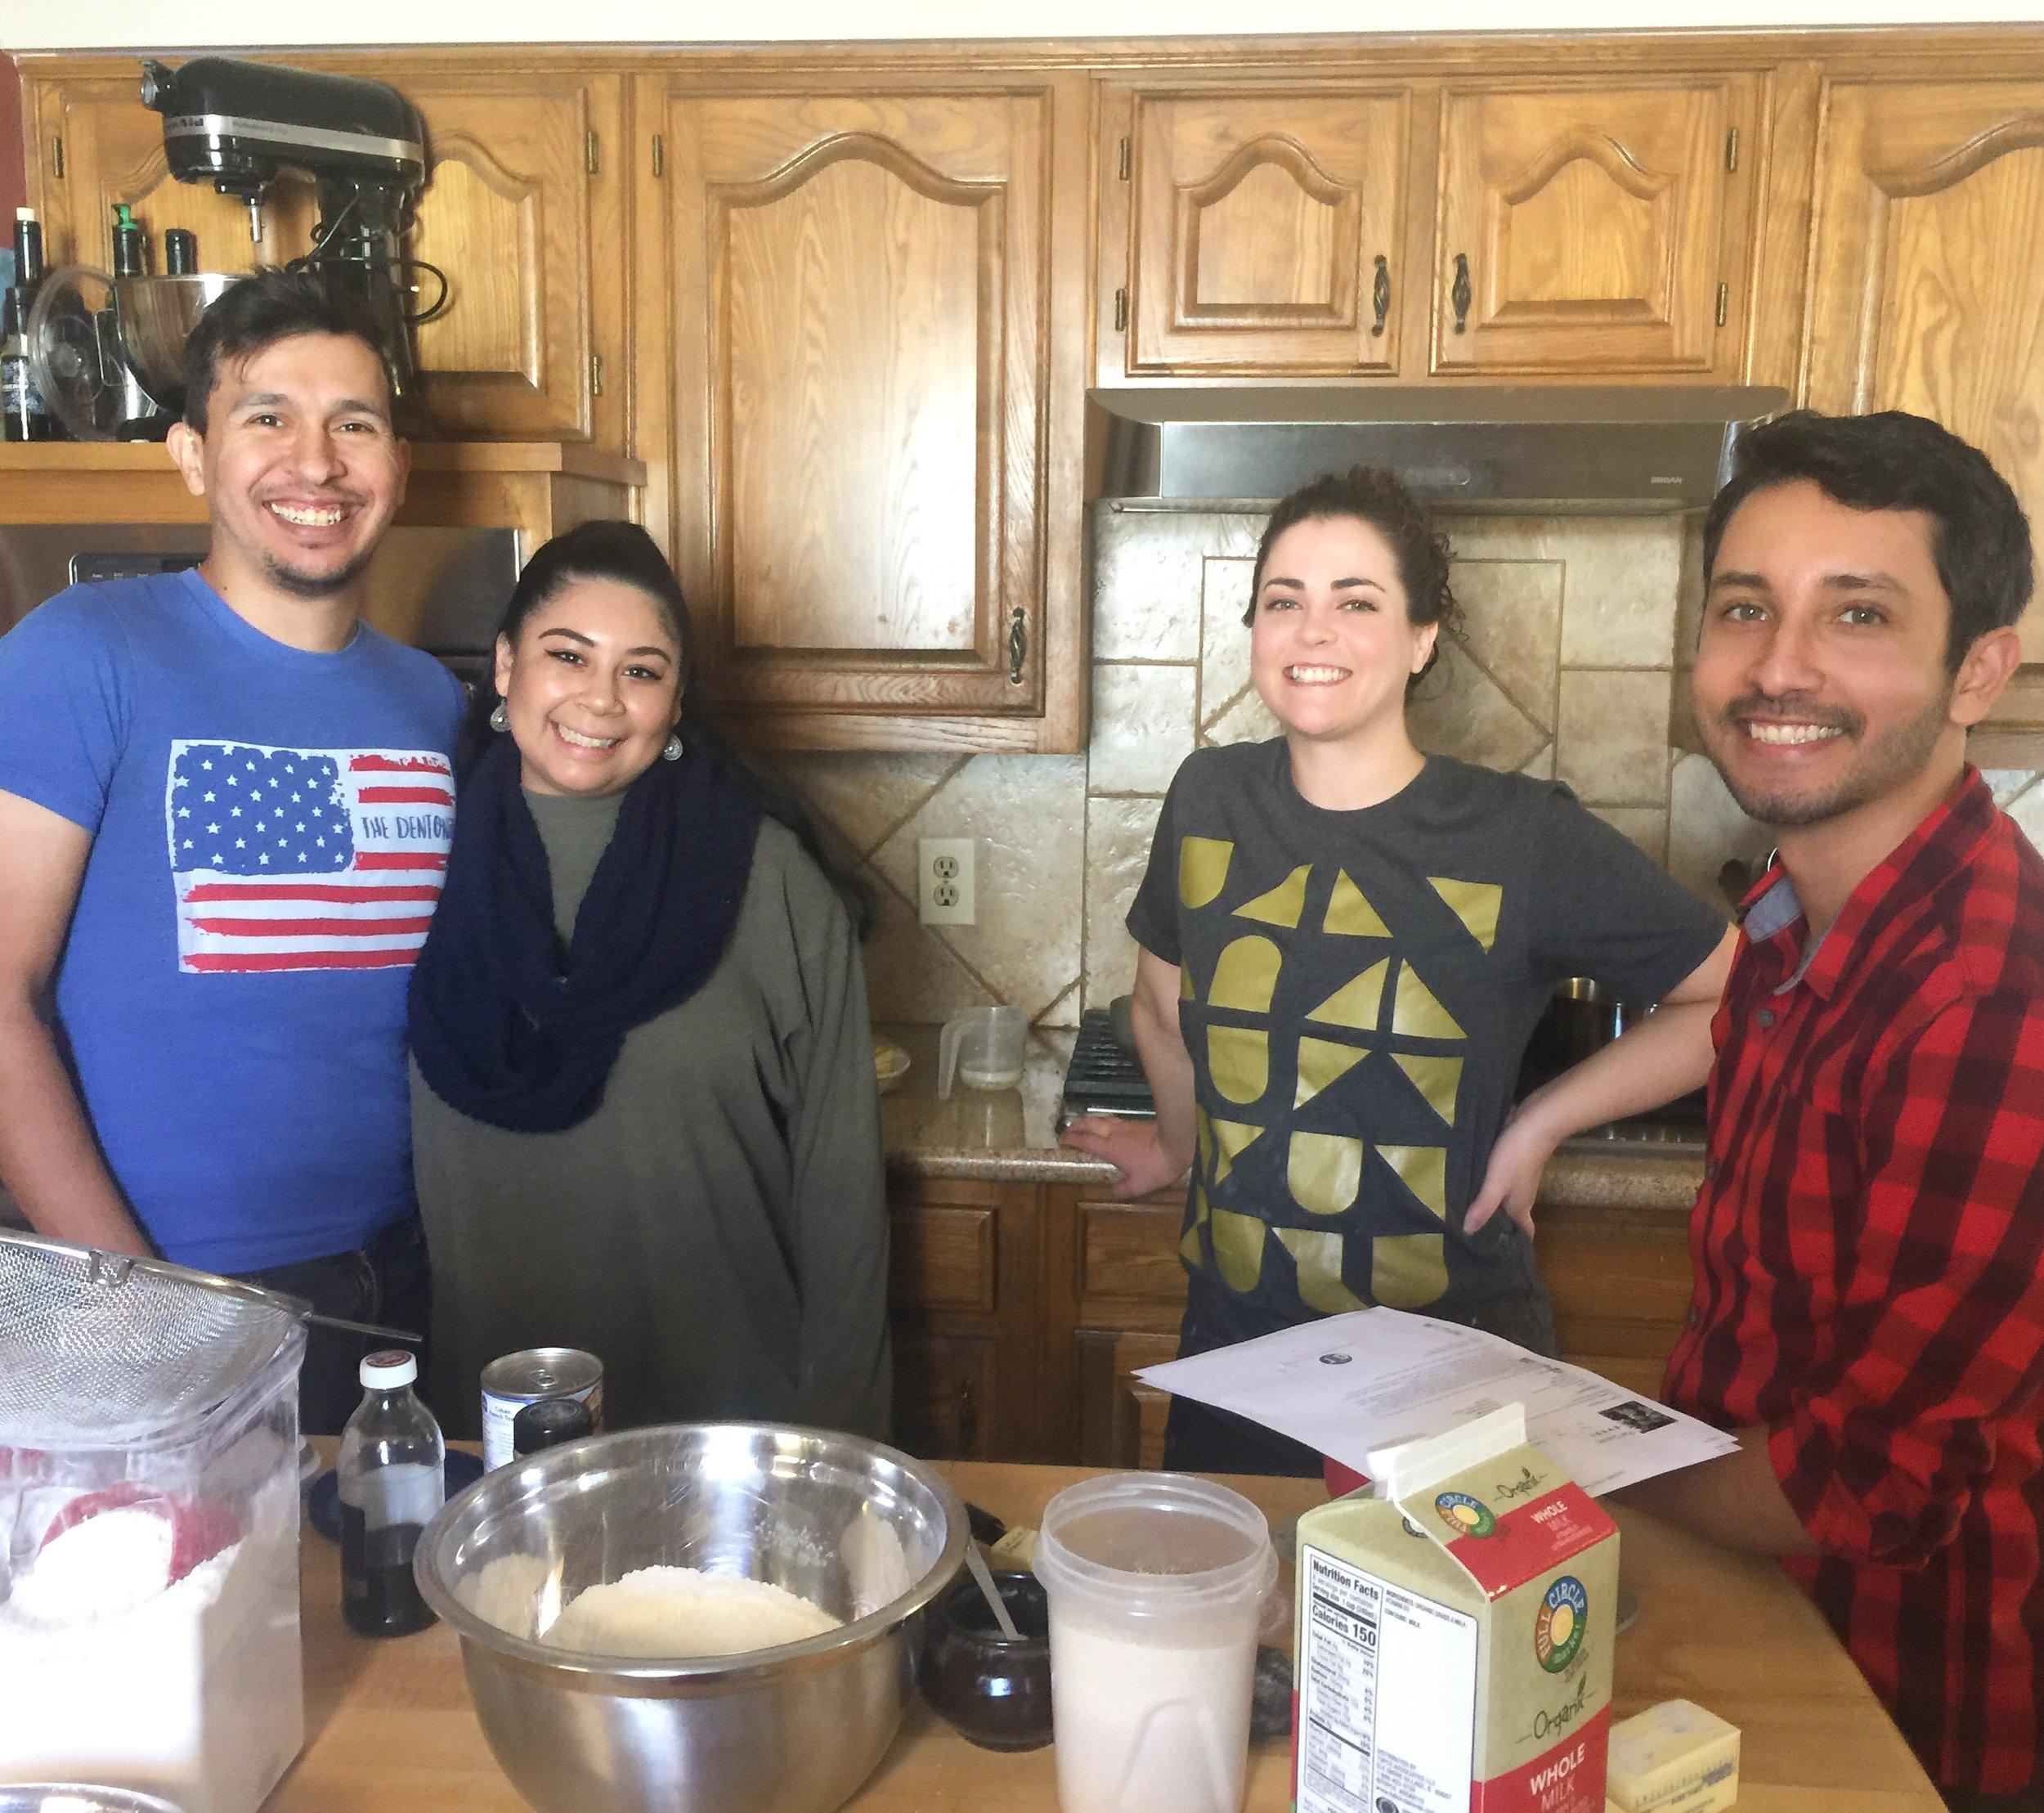 Mateo, Anjelica, and Samuel gettin' their bake on!